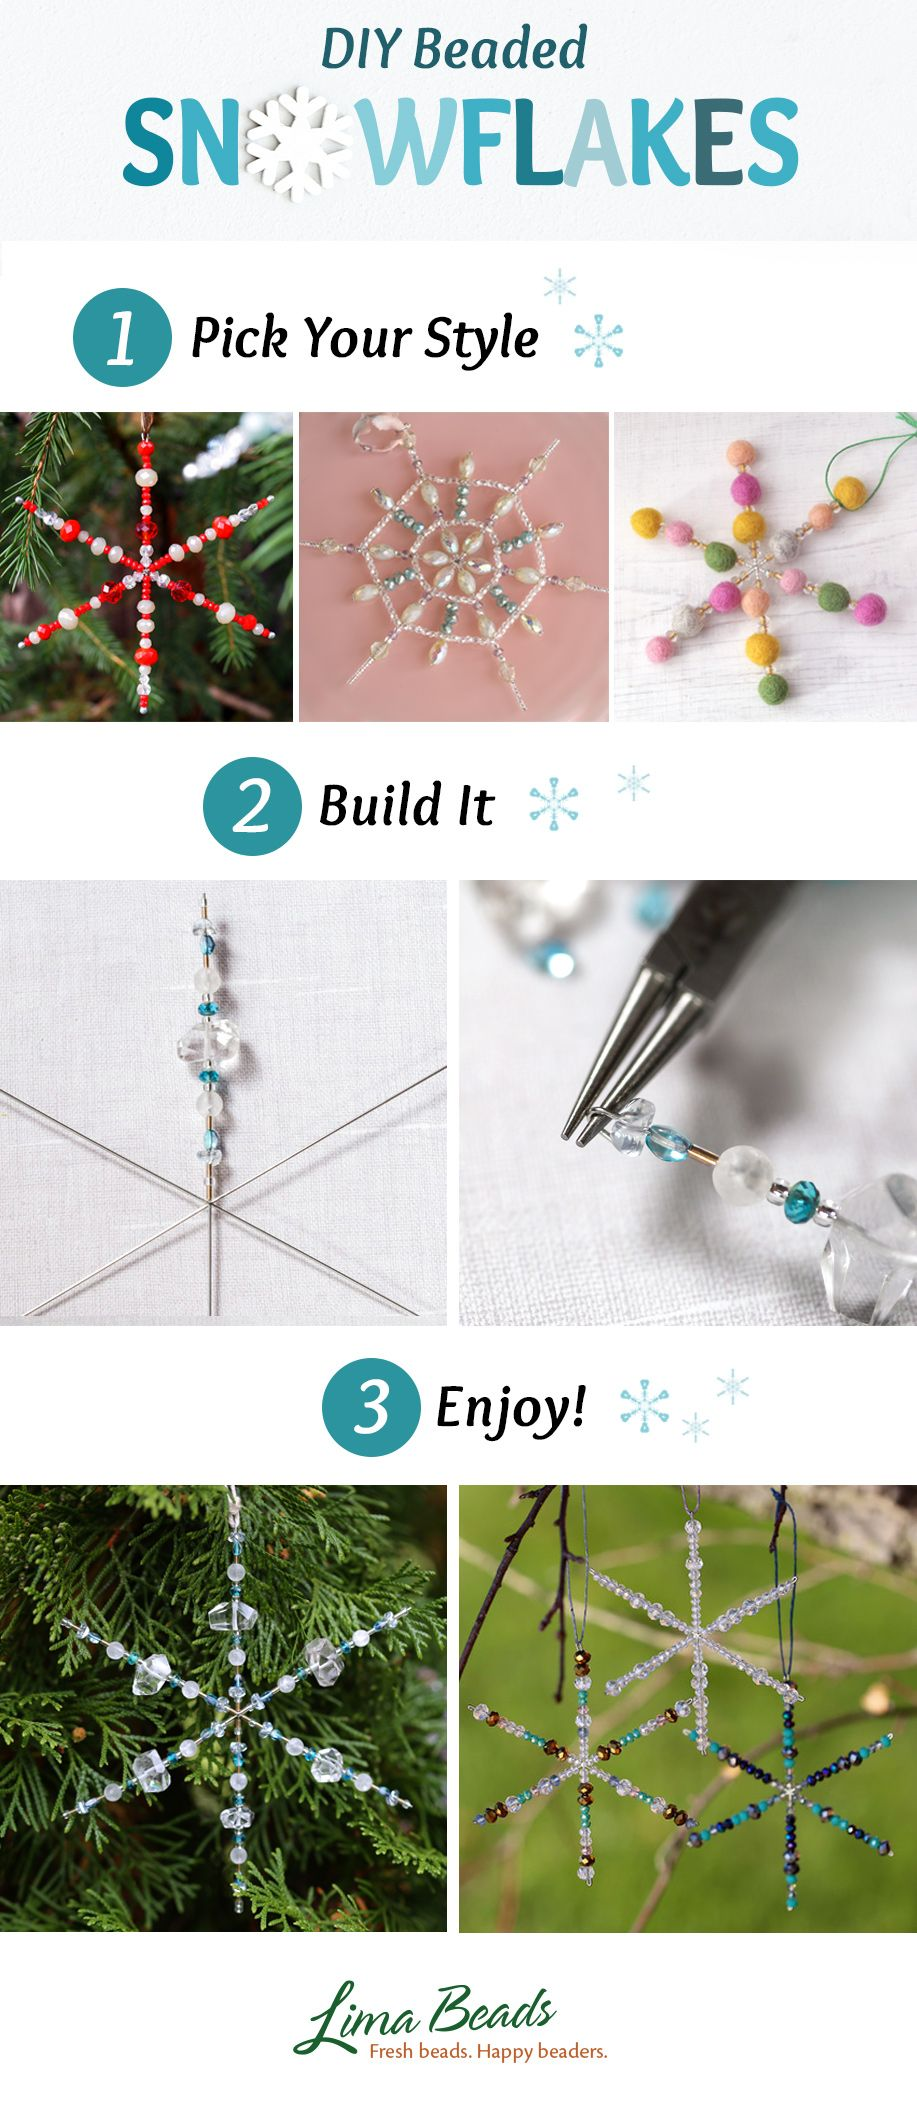 Diy Beaded Snowflakes Diy Christmas Decorations Easy Christmas Crafts Diy Christmas Ornaments